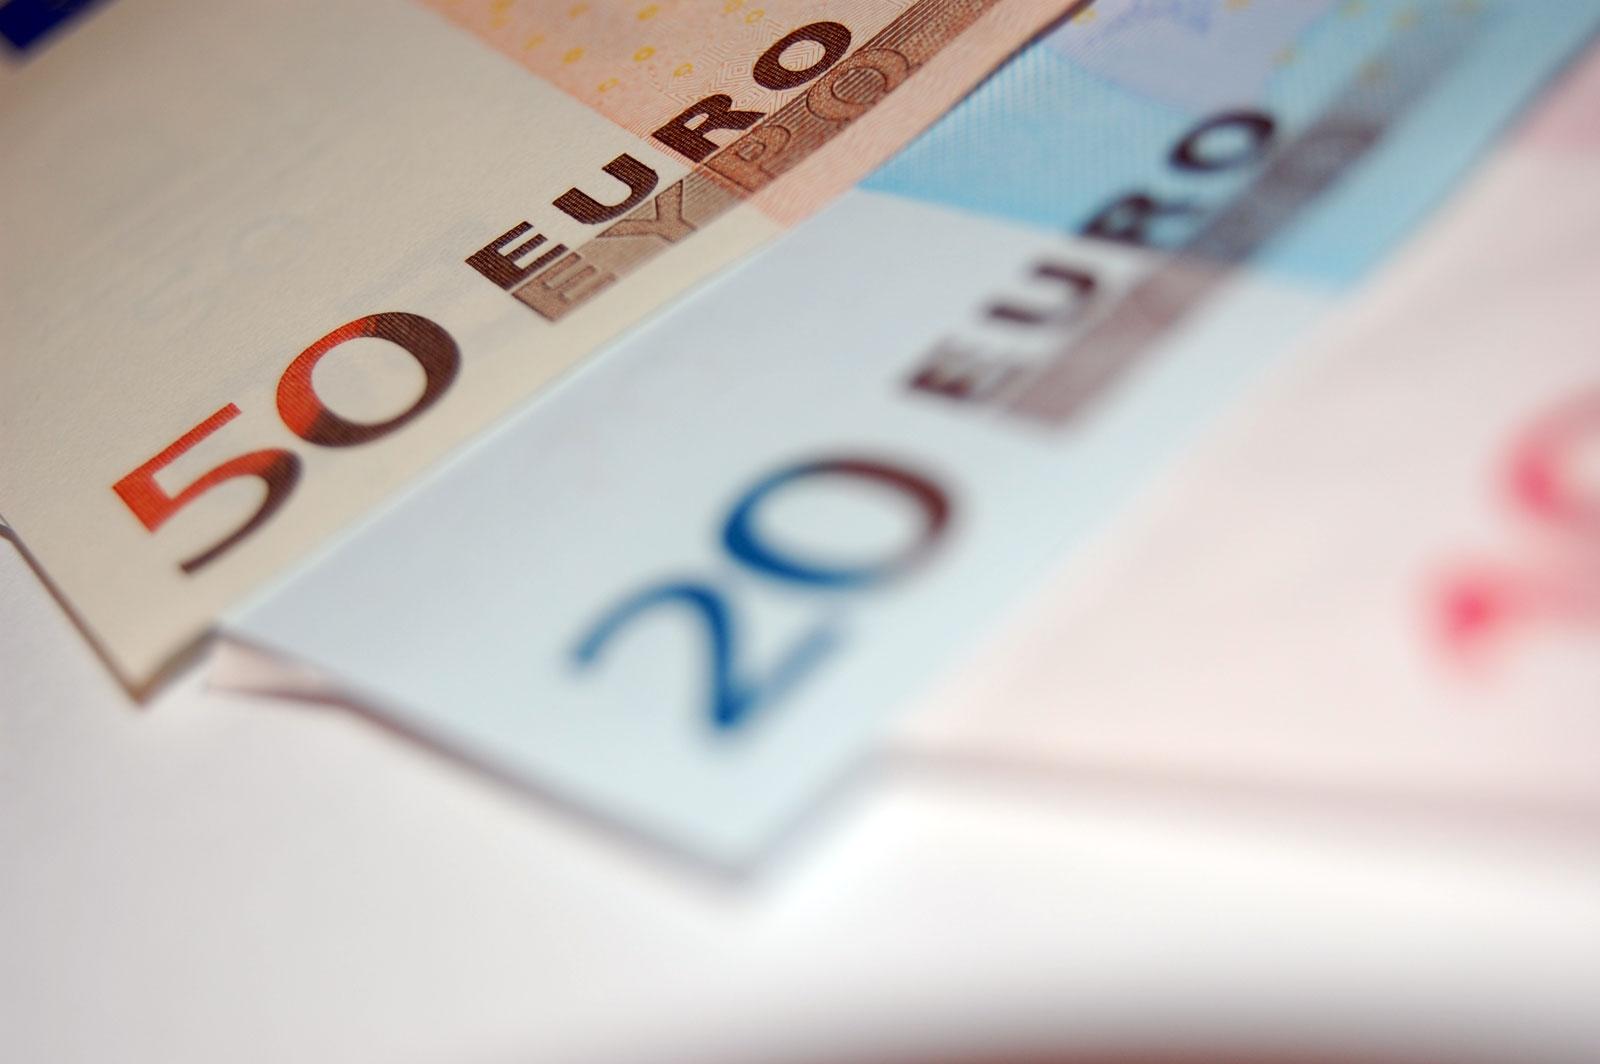 50-and-20-euro-bills